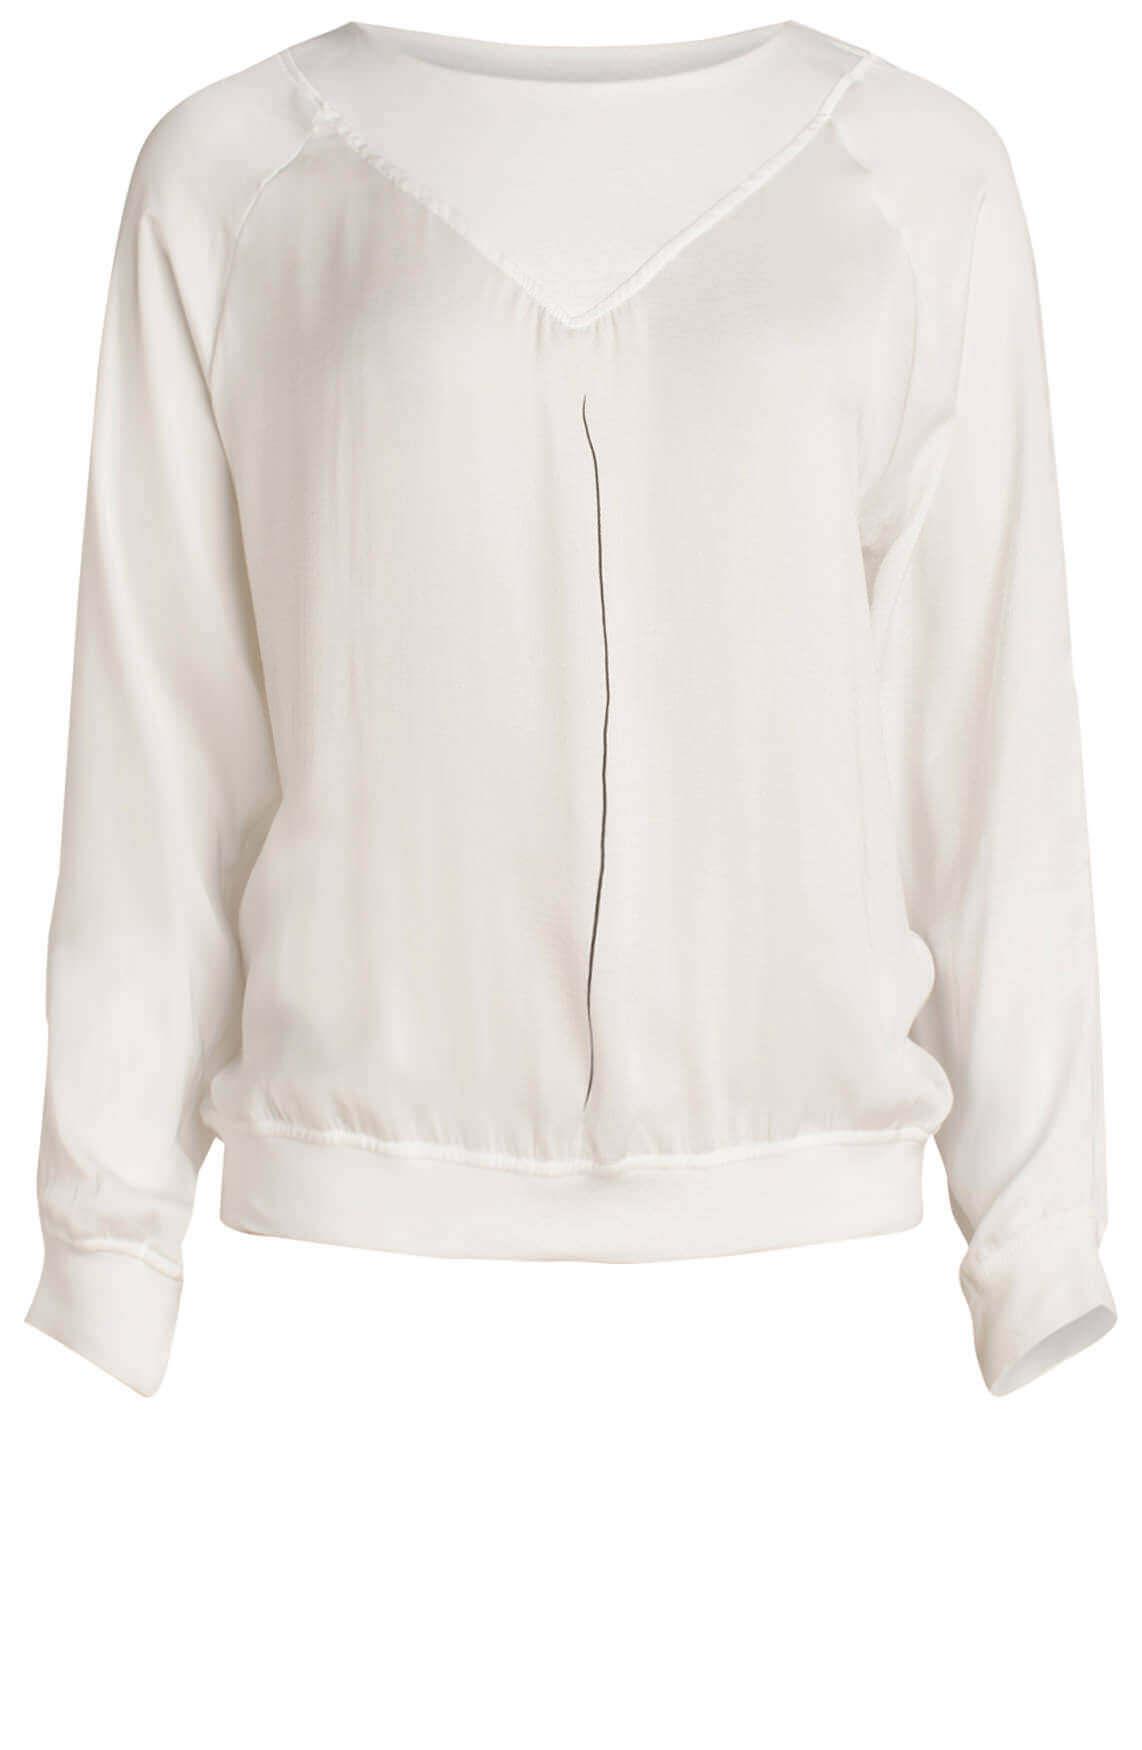 10 Days Dames Materiaalmix blouse wit